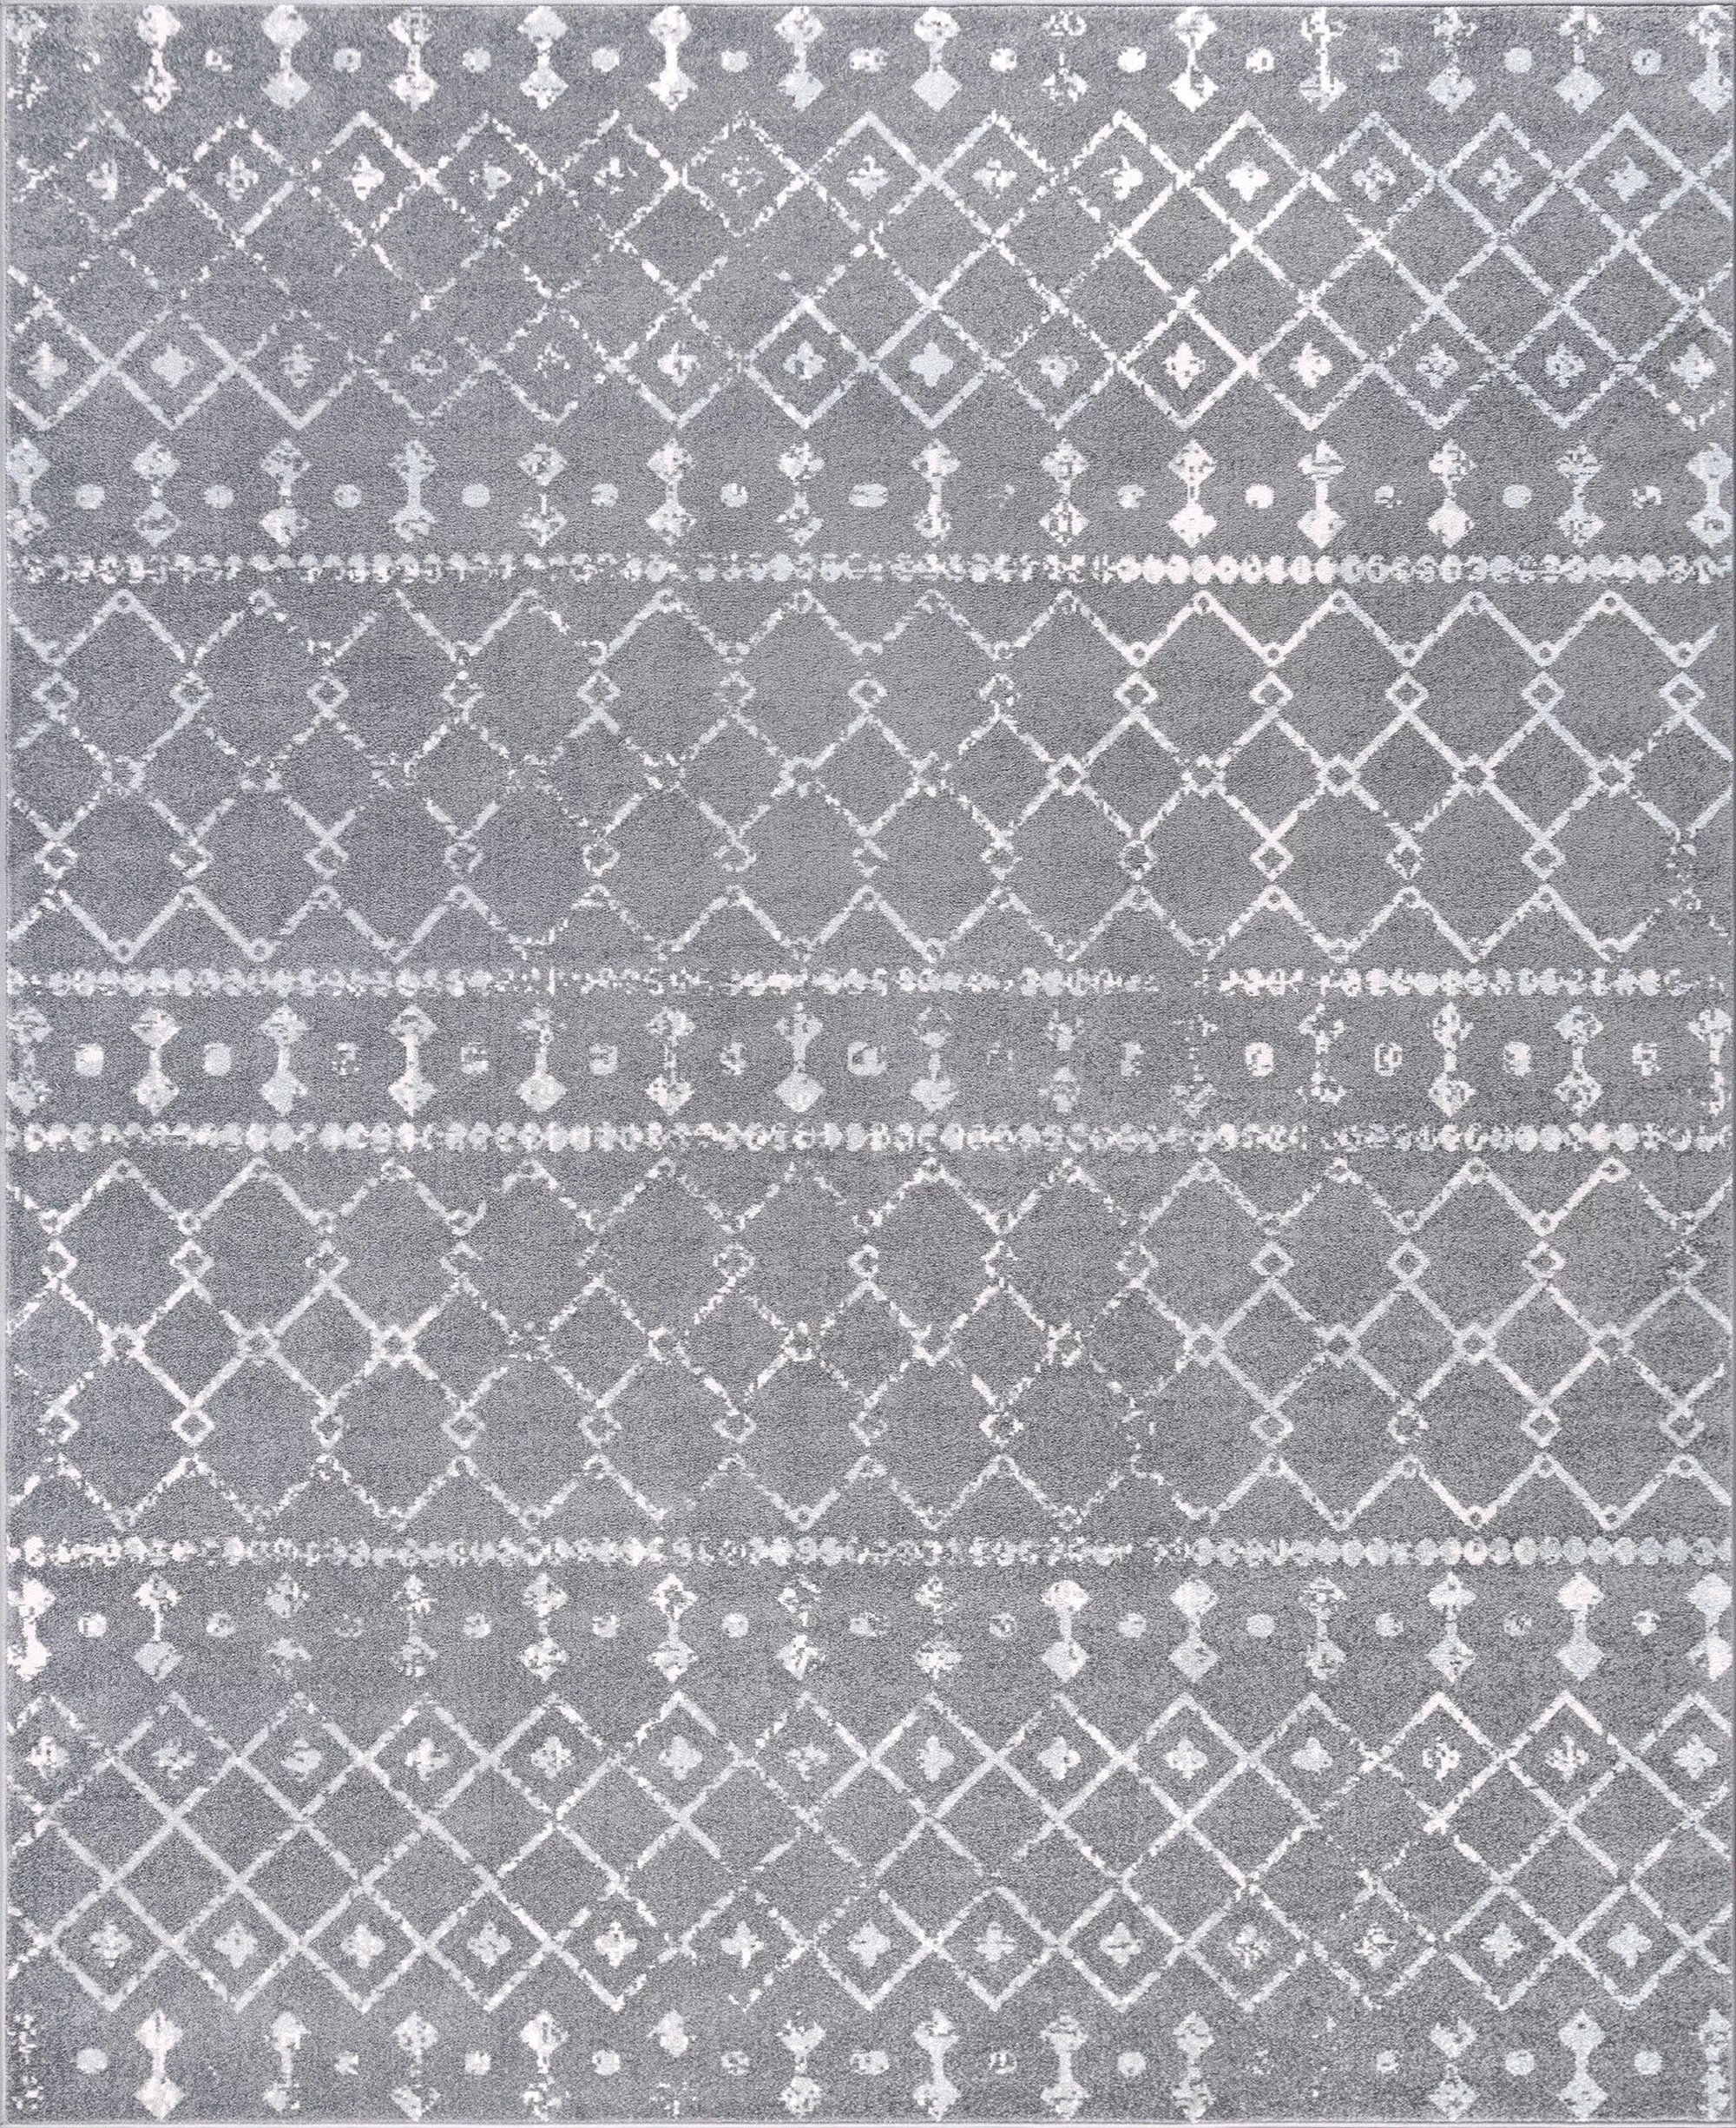 Union Rustic Adler Geometric Gray Area Rug